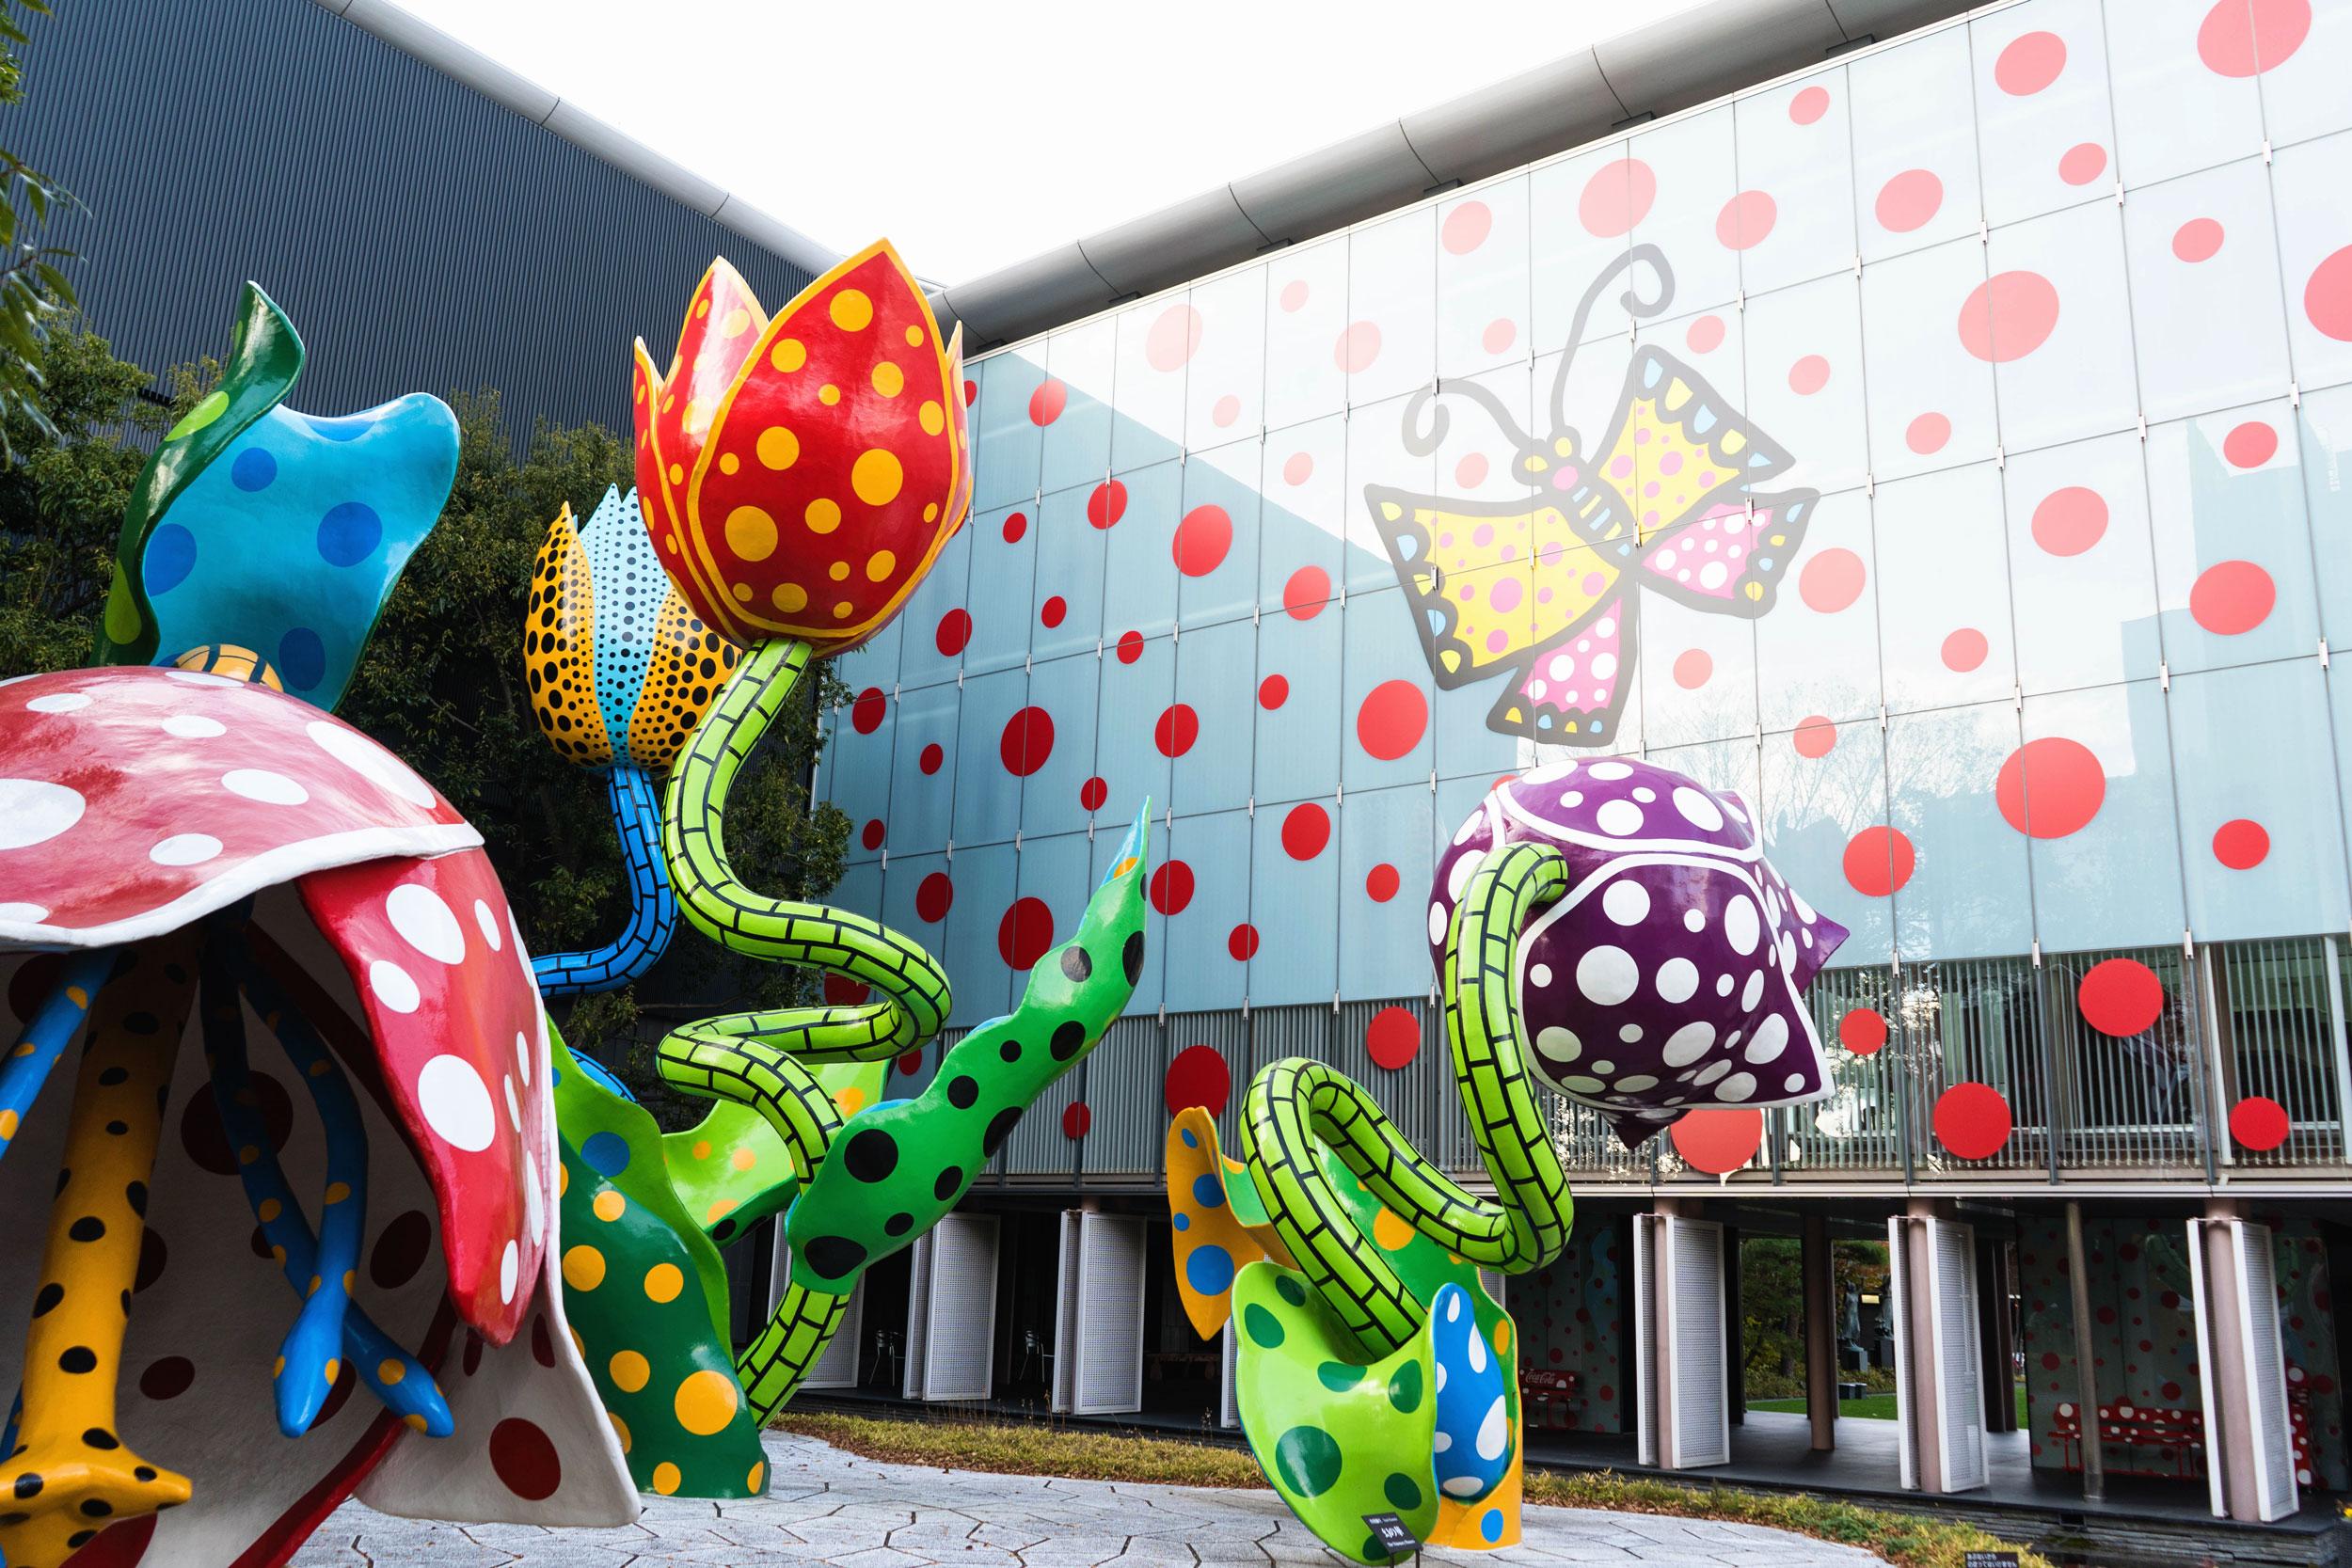 Matsumoto City Museum of Art decorated in art by Yayoi Kusama